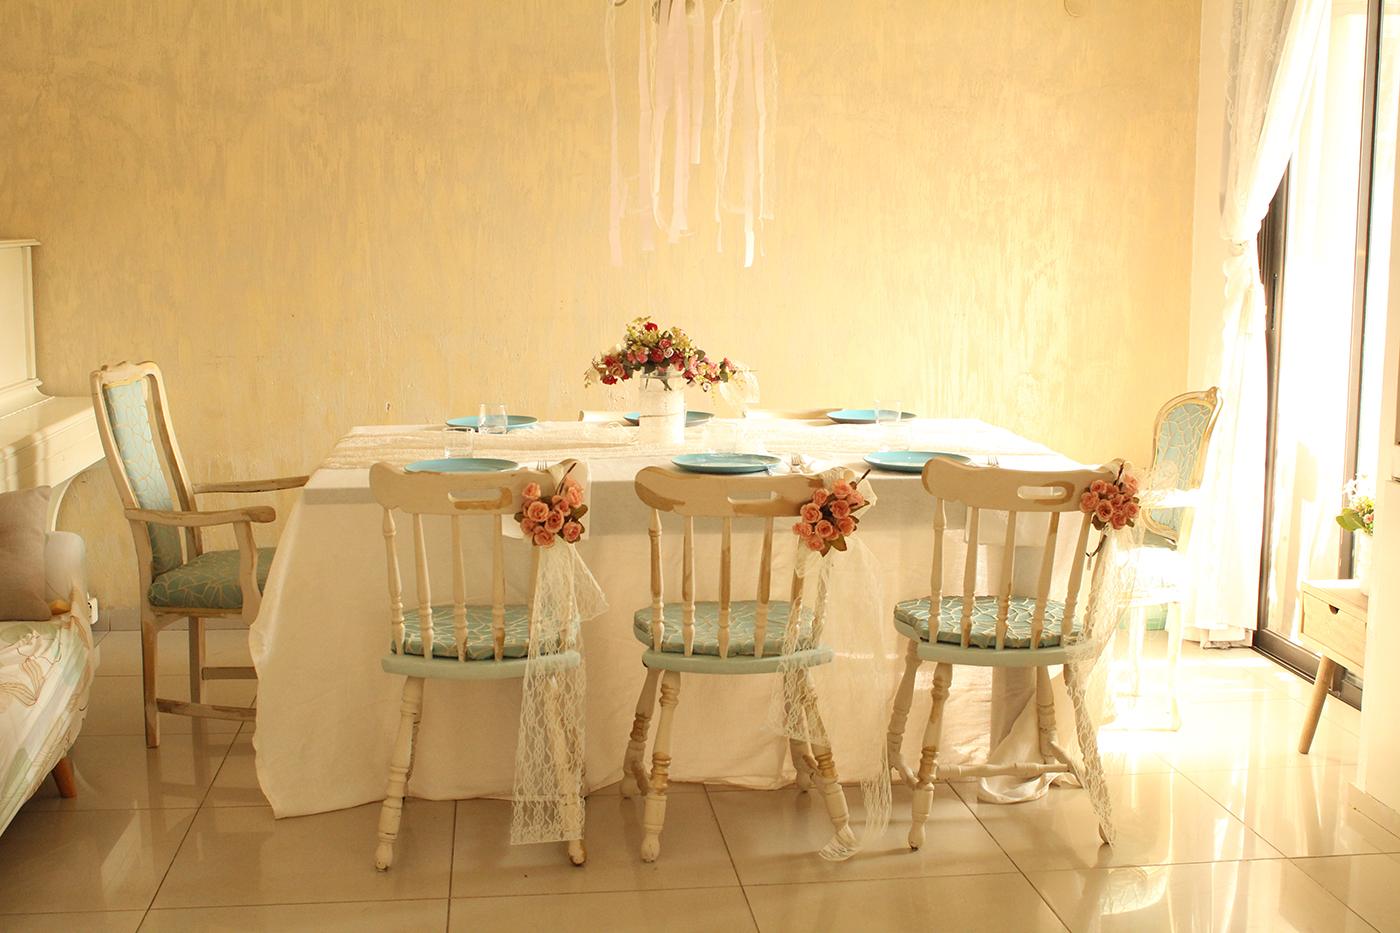 IMG 8146 - חידוש כסאות לפינת אוכל בסלון